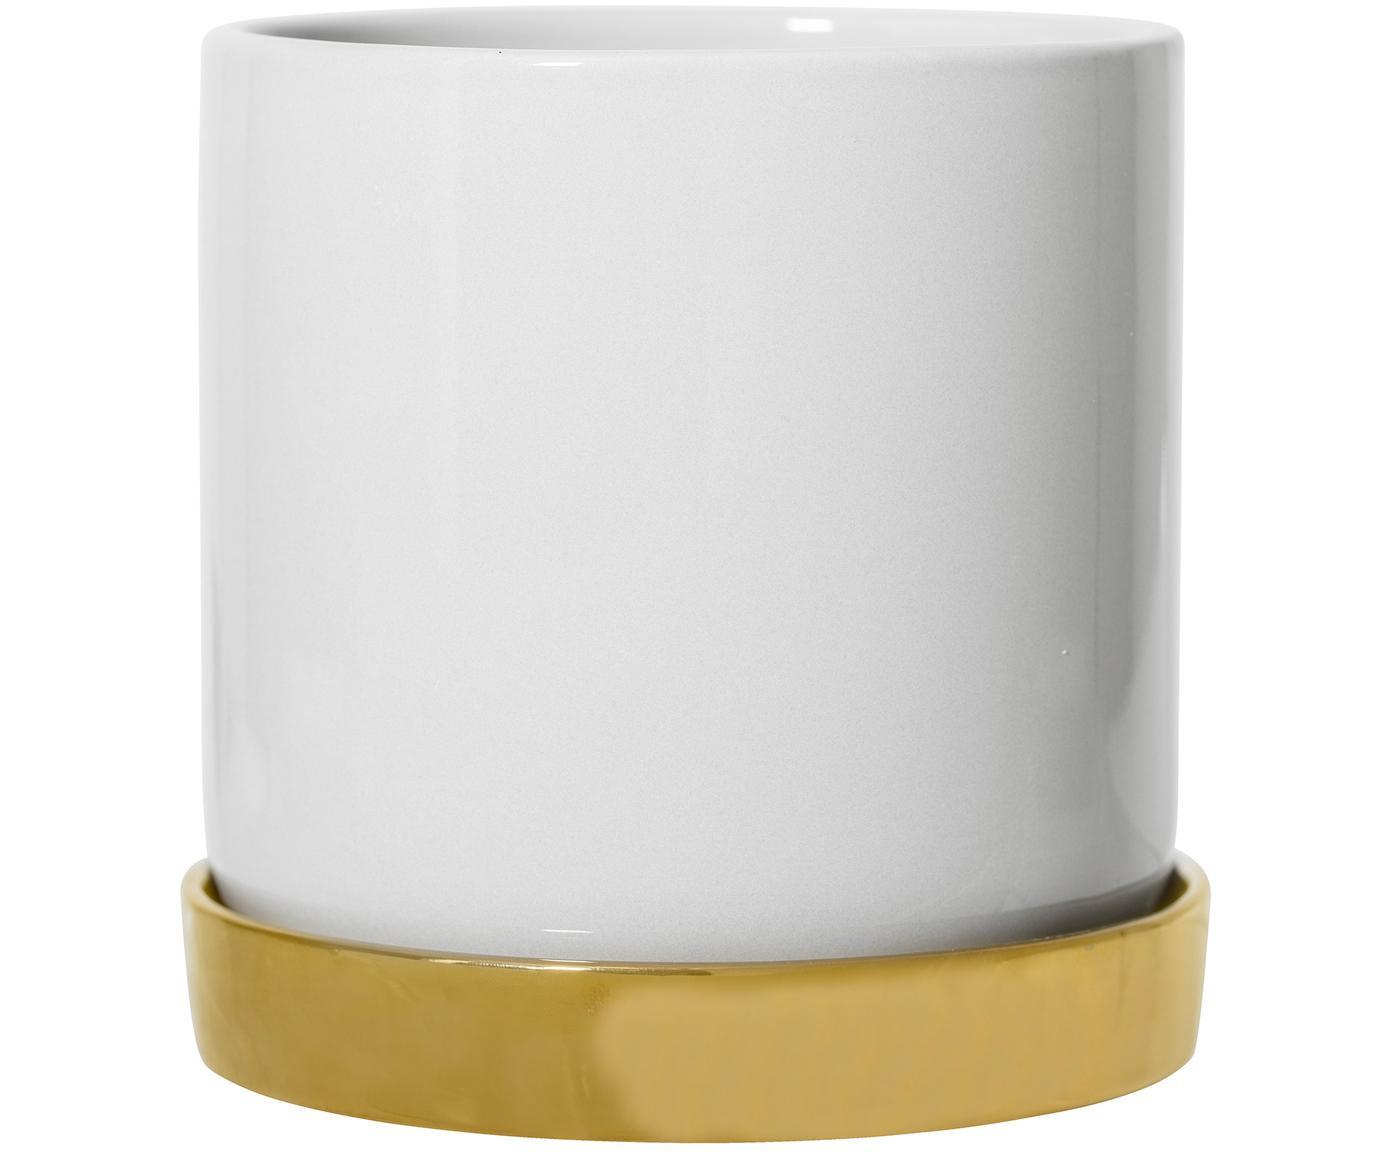 Portavaso Elin, Terracotta, Recipiente: bianco, Sottobicchiere: dorato, Ø 14 x Alt. 14 cm